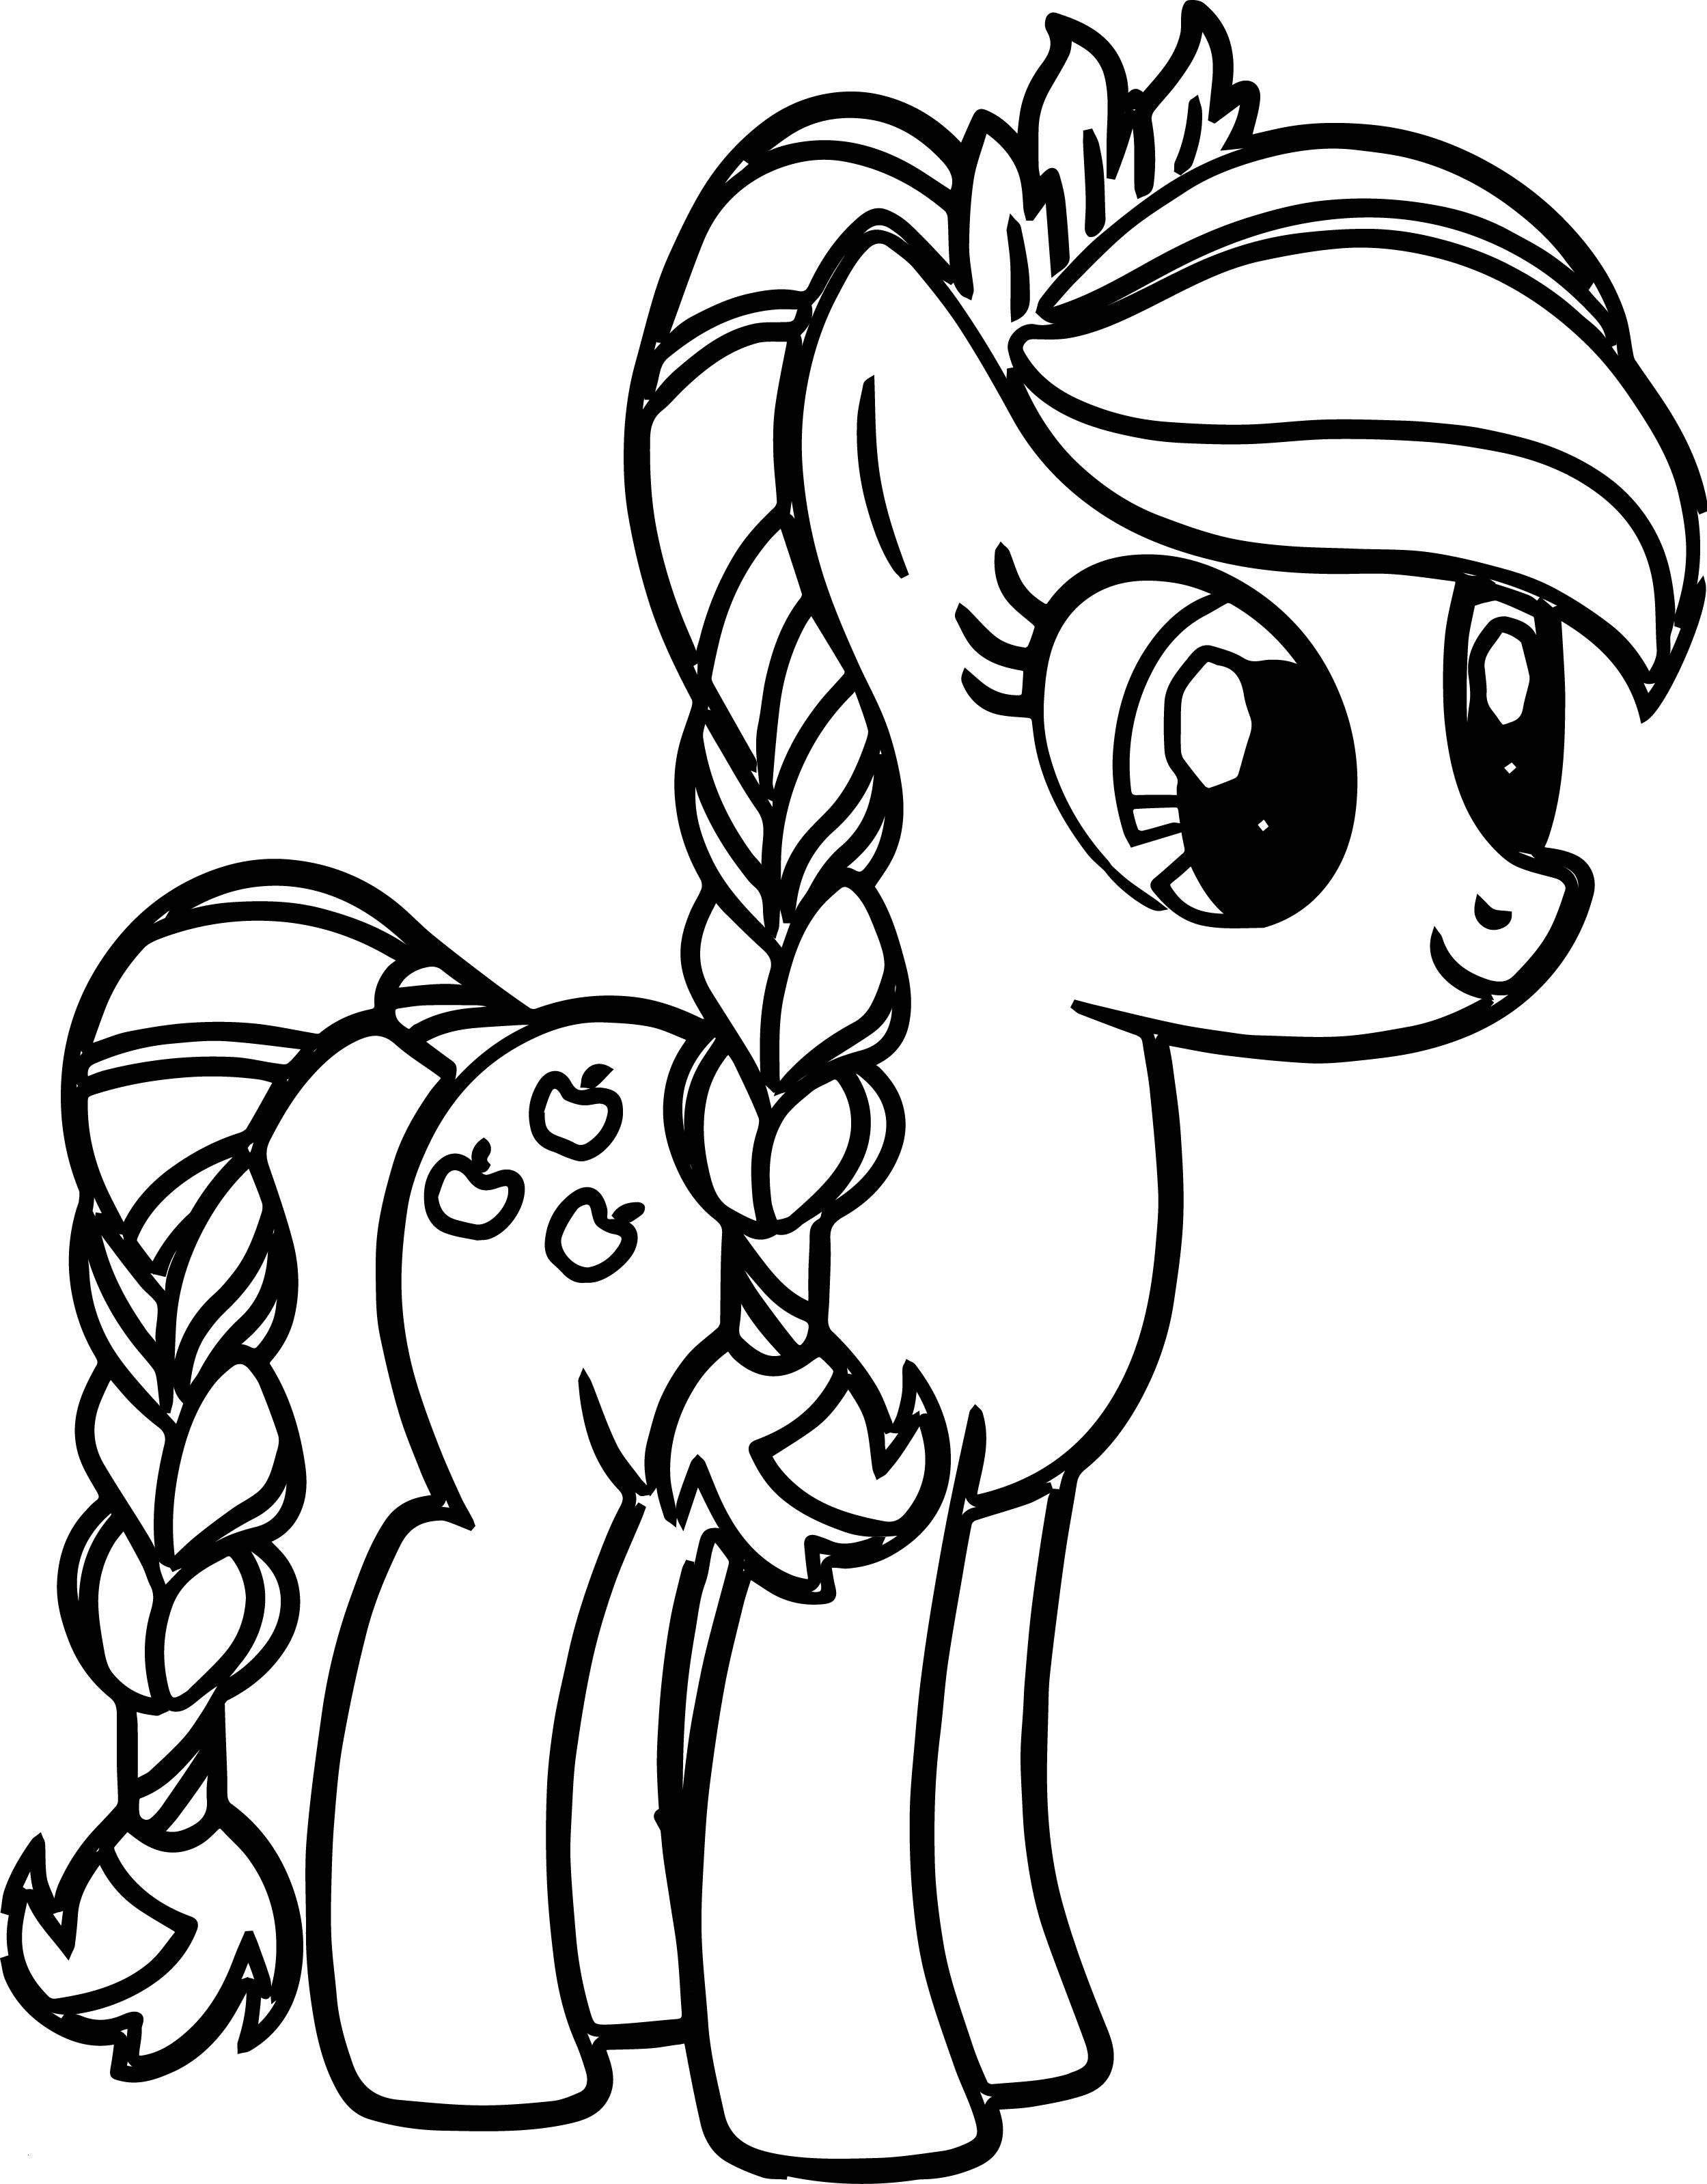 My Little Pony Rainbow Dash Ausmalbilder Neu My Little Pony Ausmalbilder Zum Ausdrucken Kostenlos Awesome My Galerie